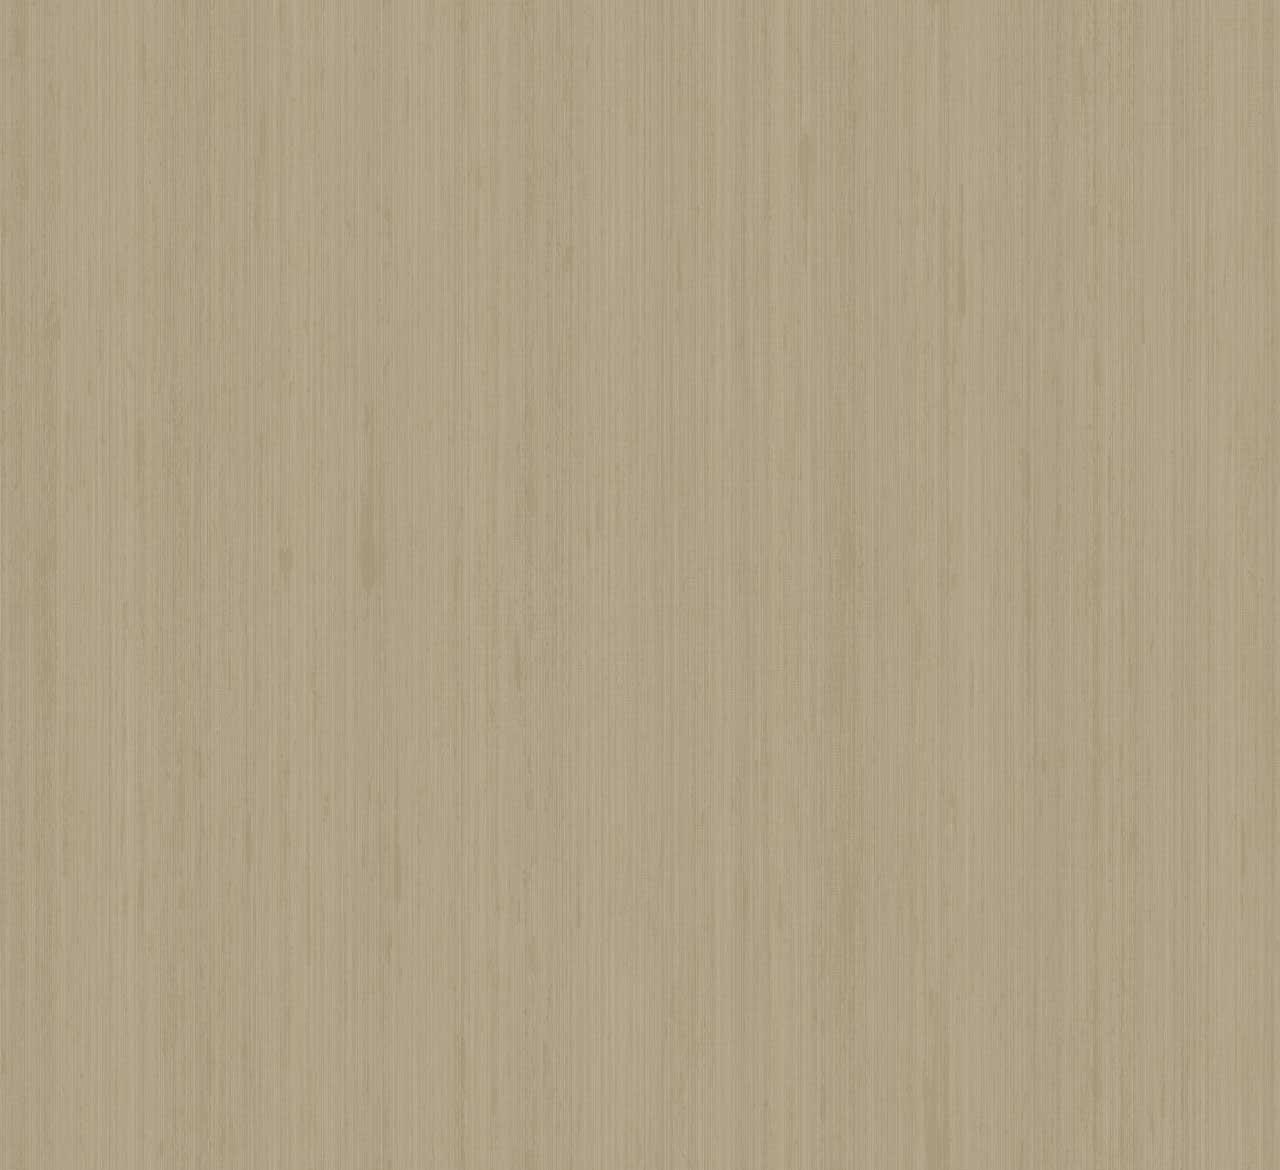 Capri-Luxury-Wallpaper-CP00737-Silk-Texture